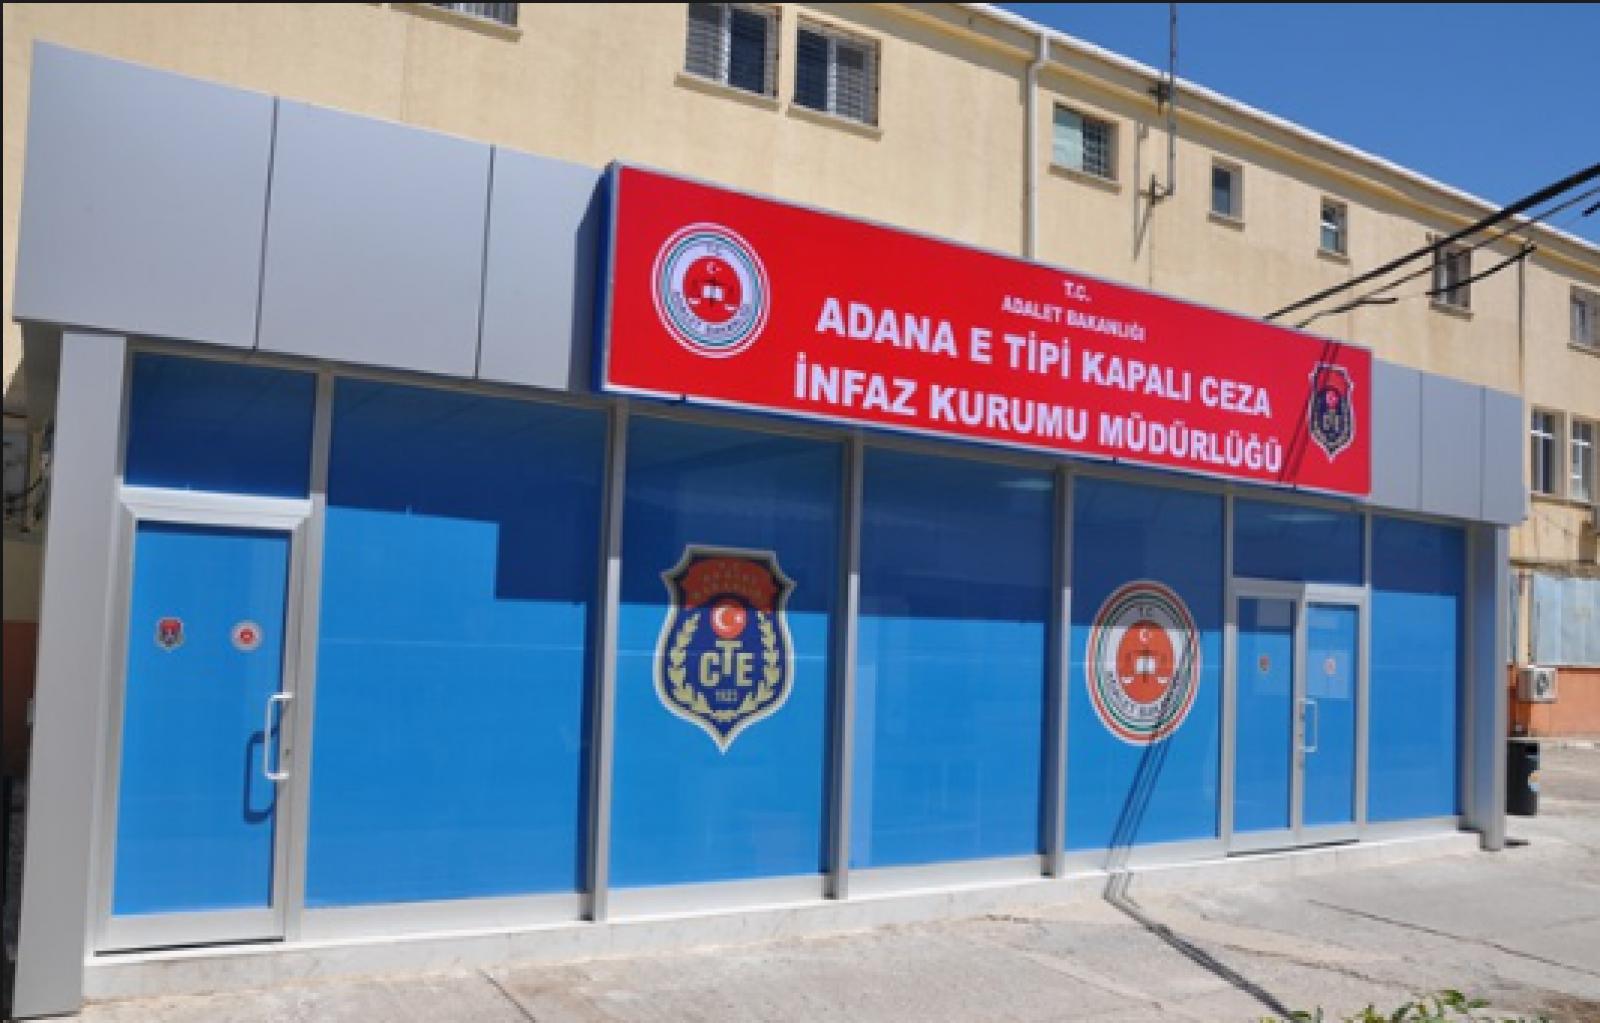 Adana Cezaevi